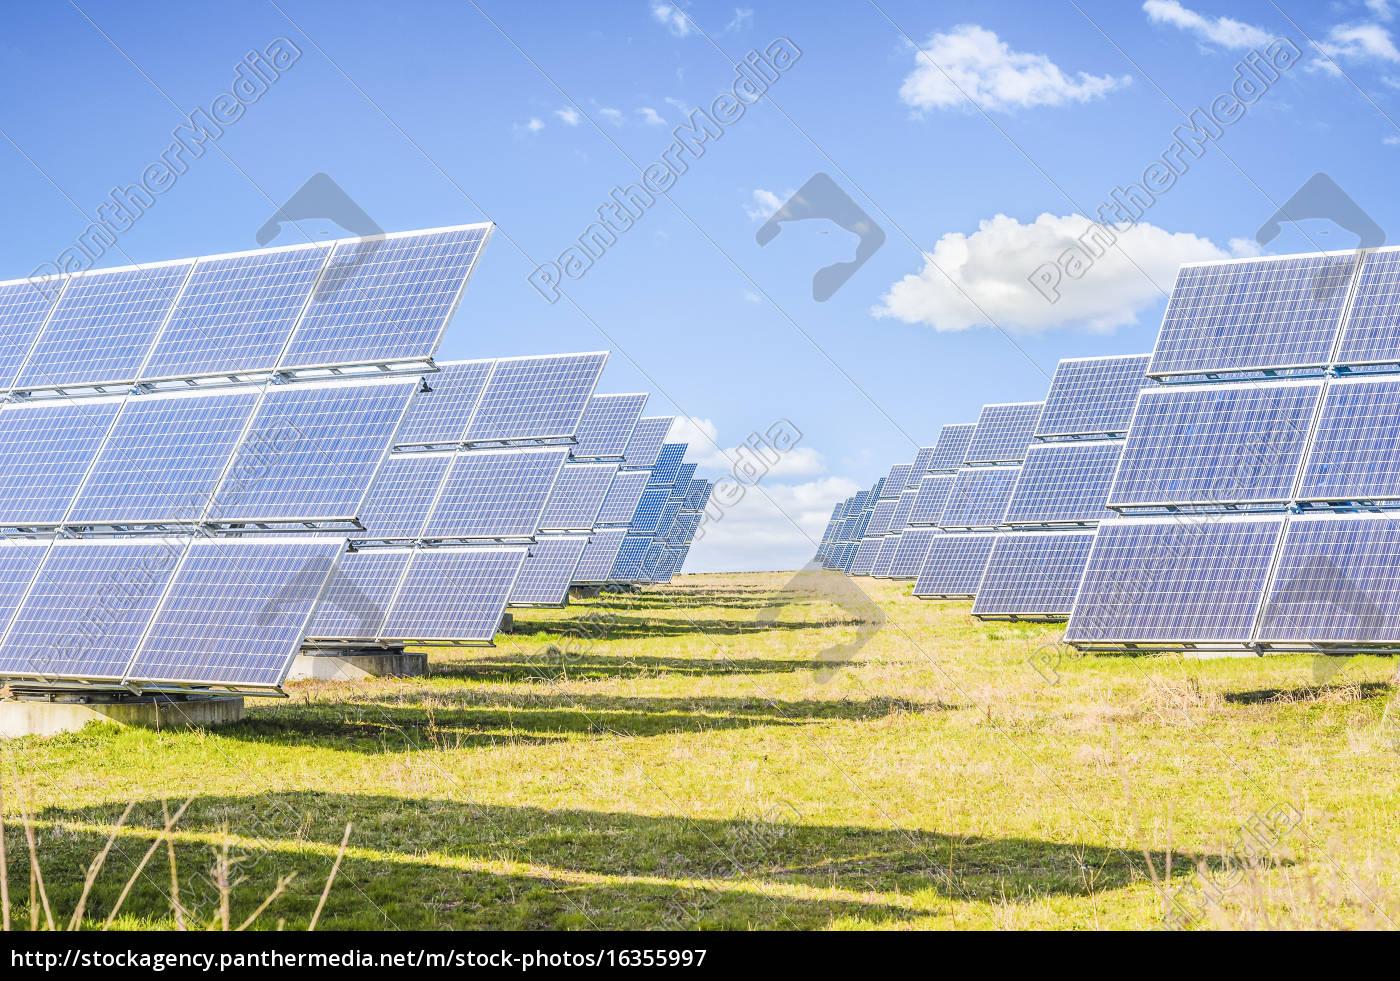 solar, panels, to, produce, green, energy. - 16355997